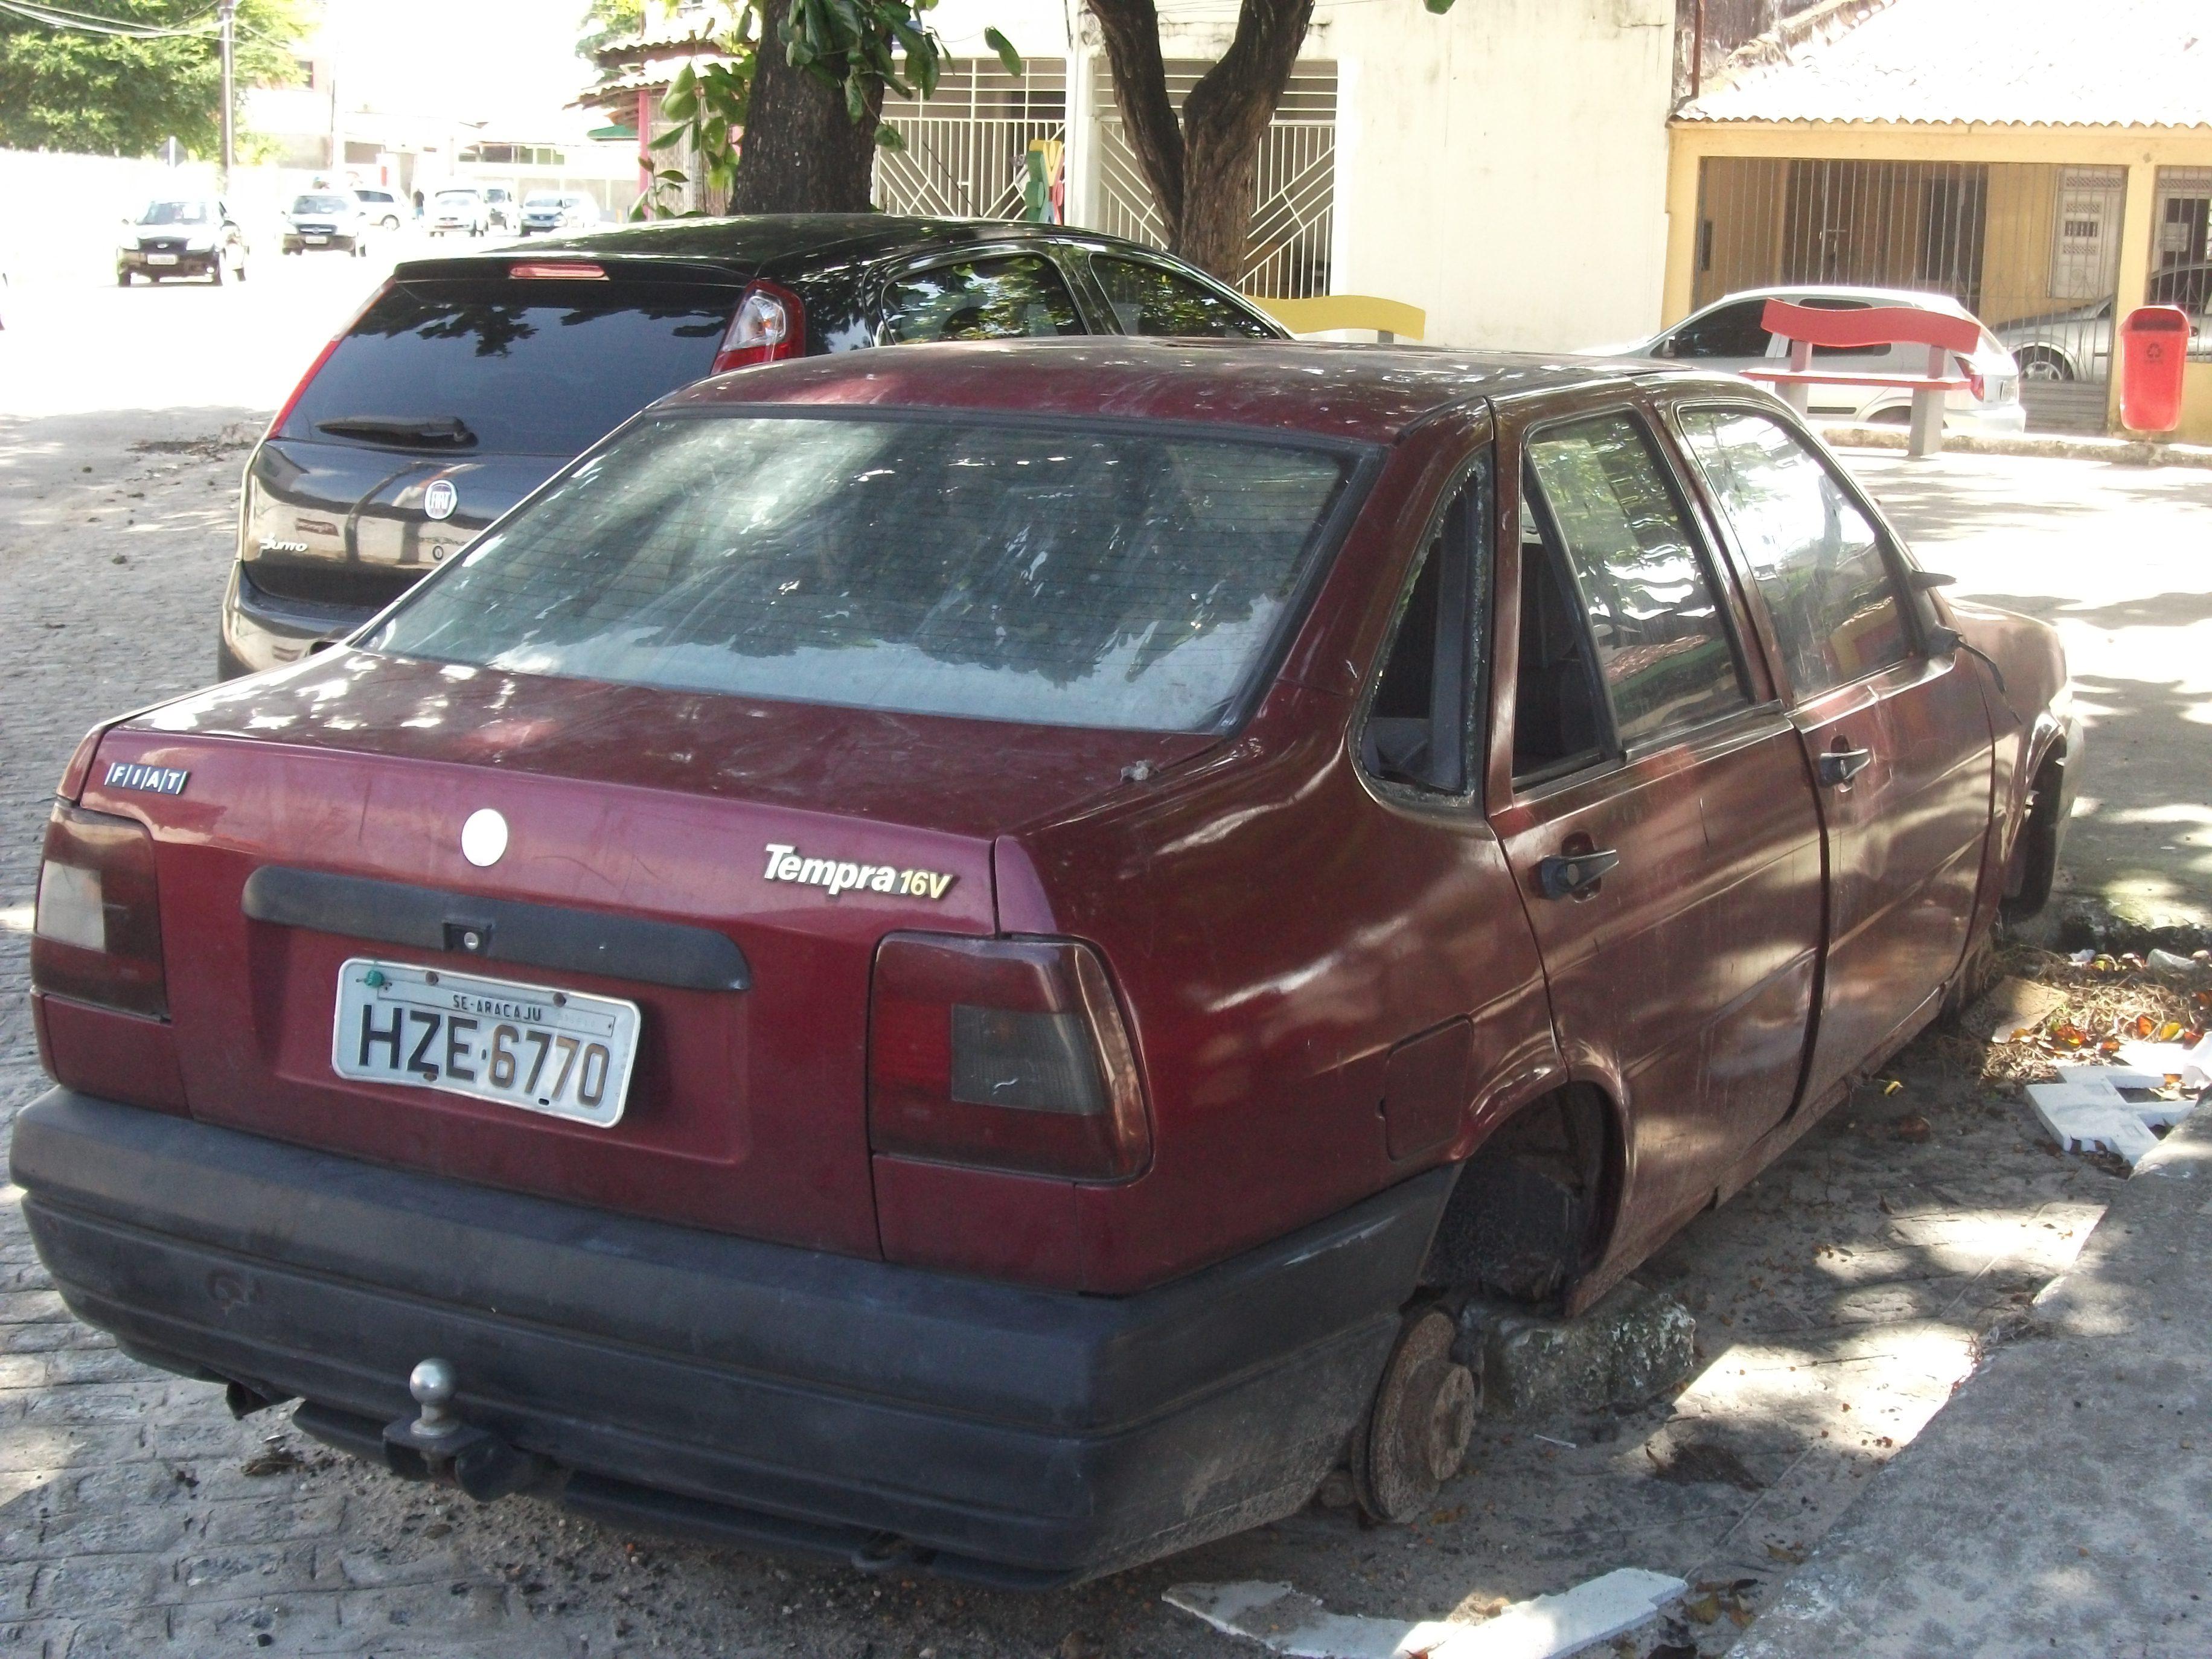 uAndré-Cortes-Bairro-Castelo-Branco-em-Aracaju-SE Fiat Tempra